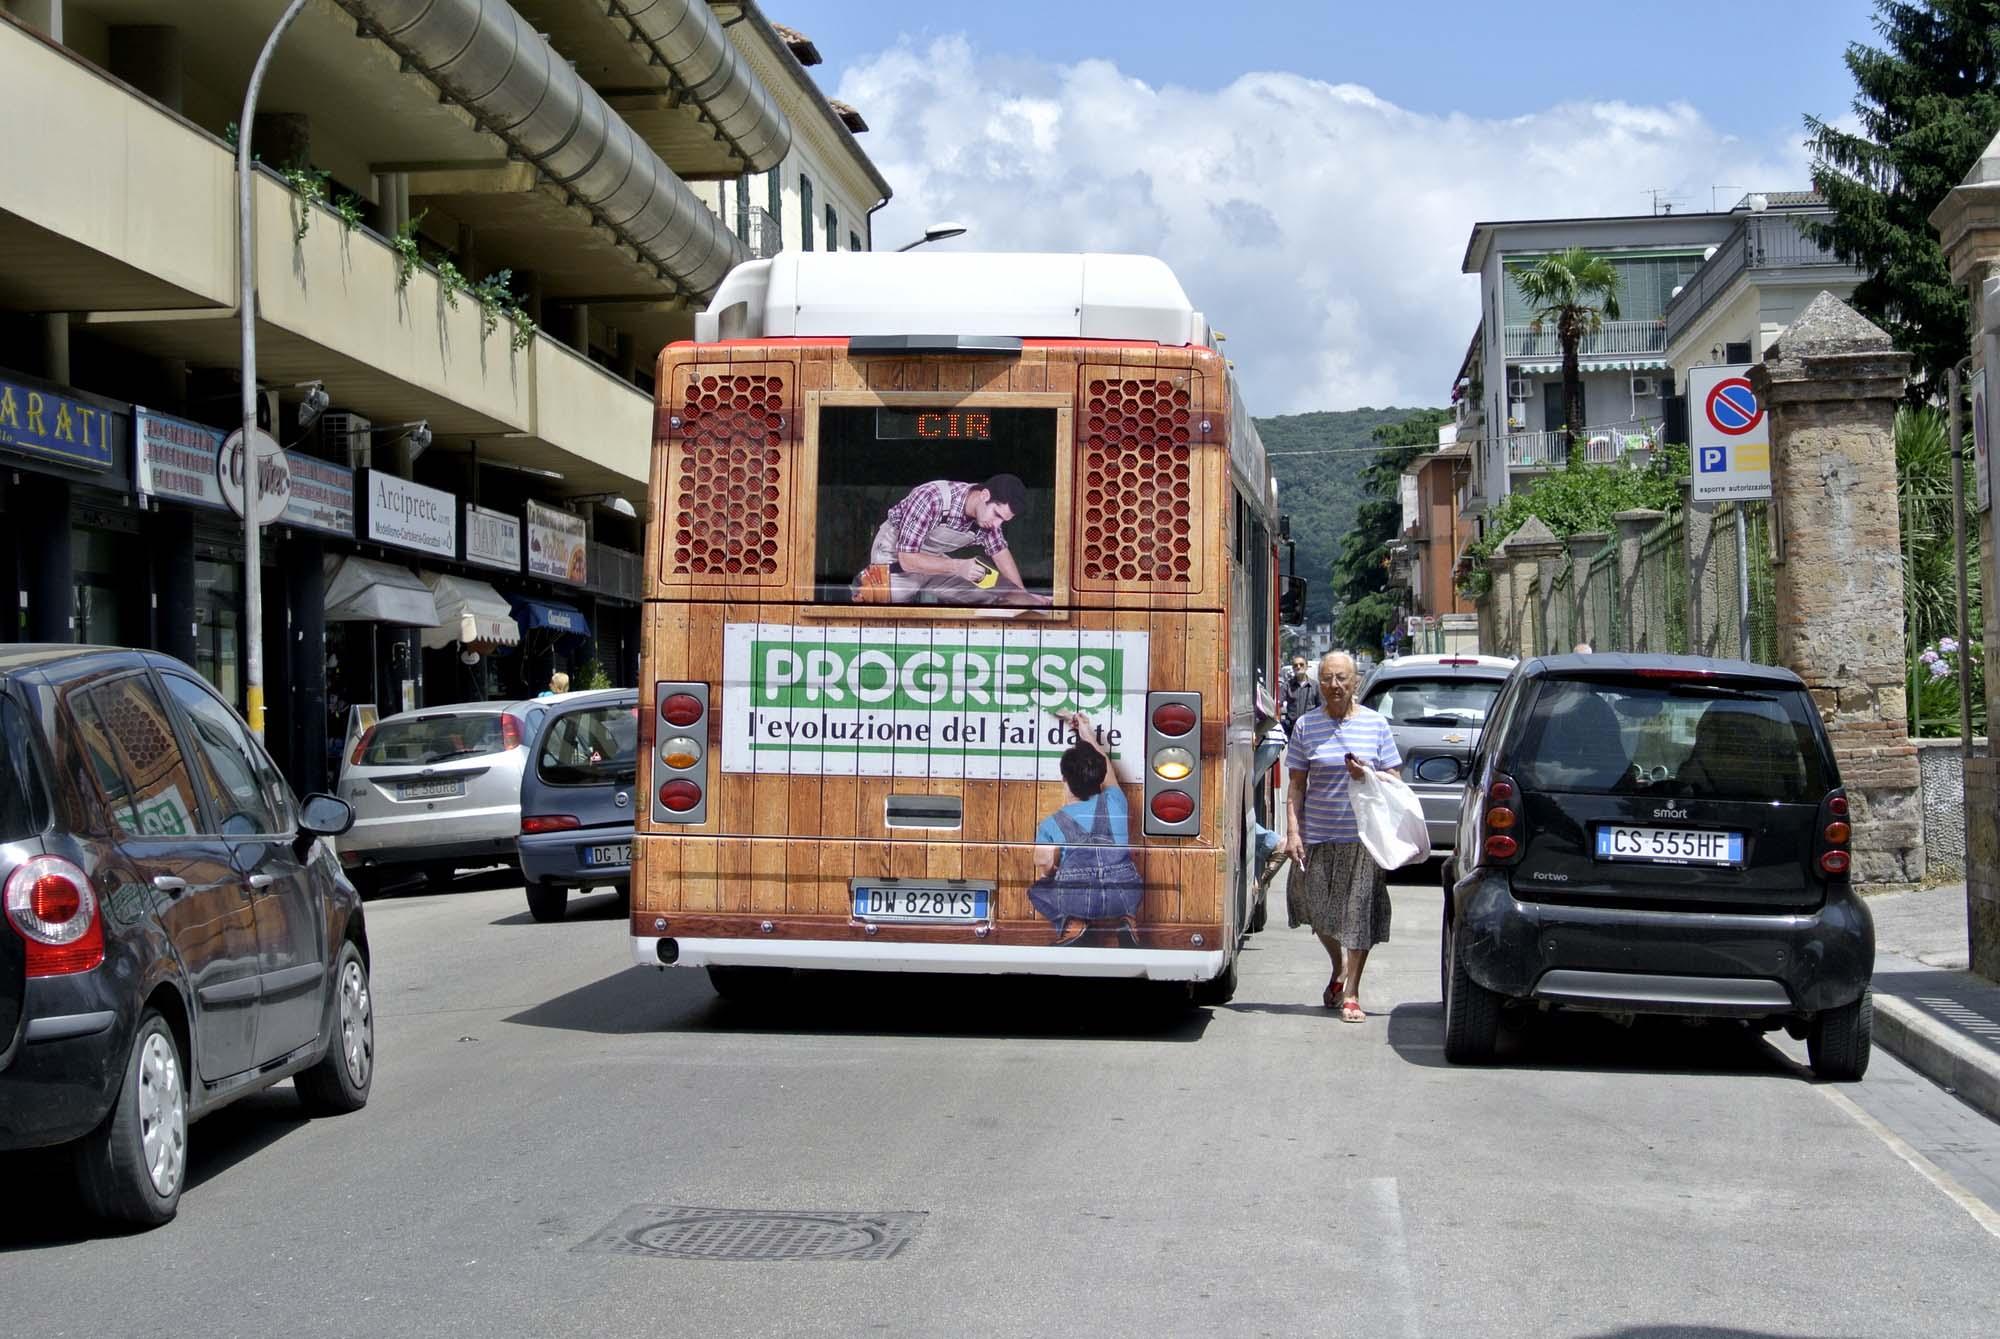 A caserta l 39 autobus targato progress for Progress caserta catalogo